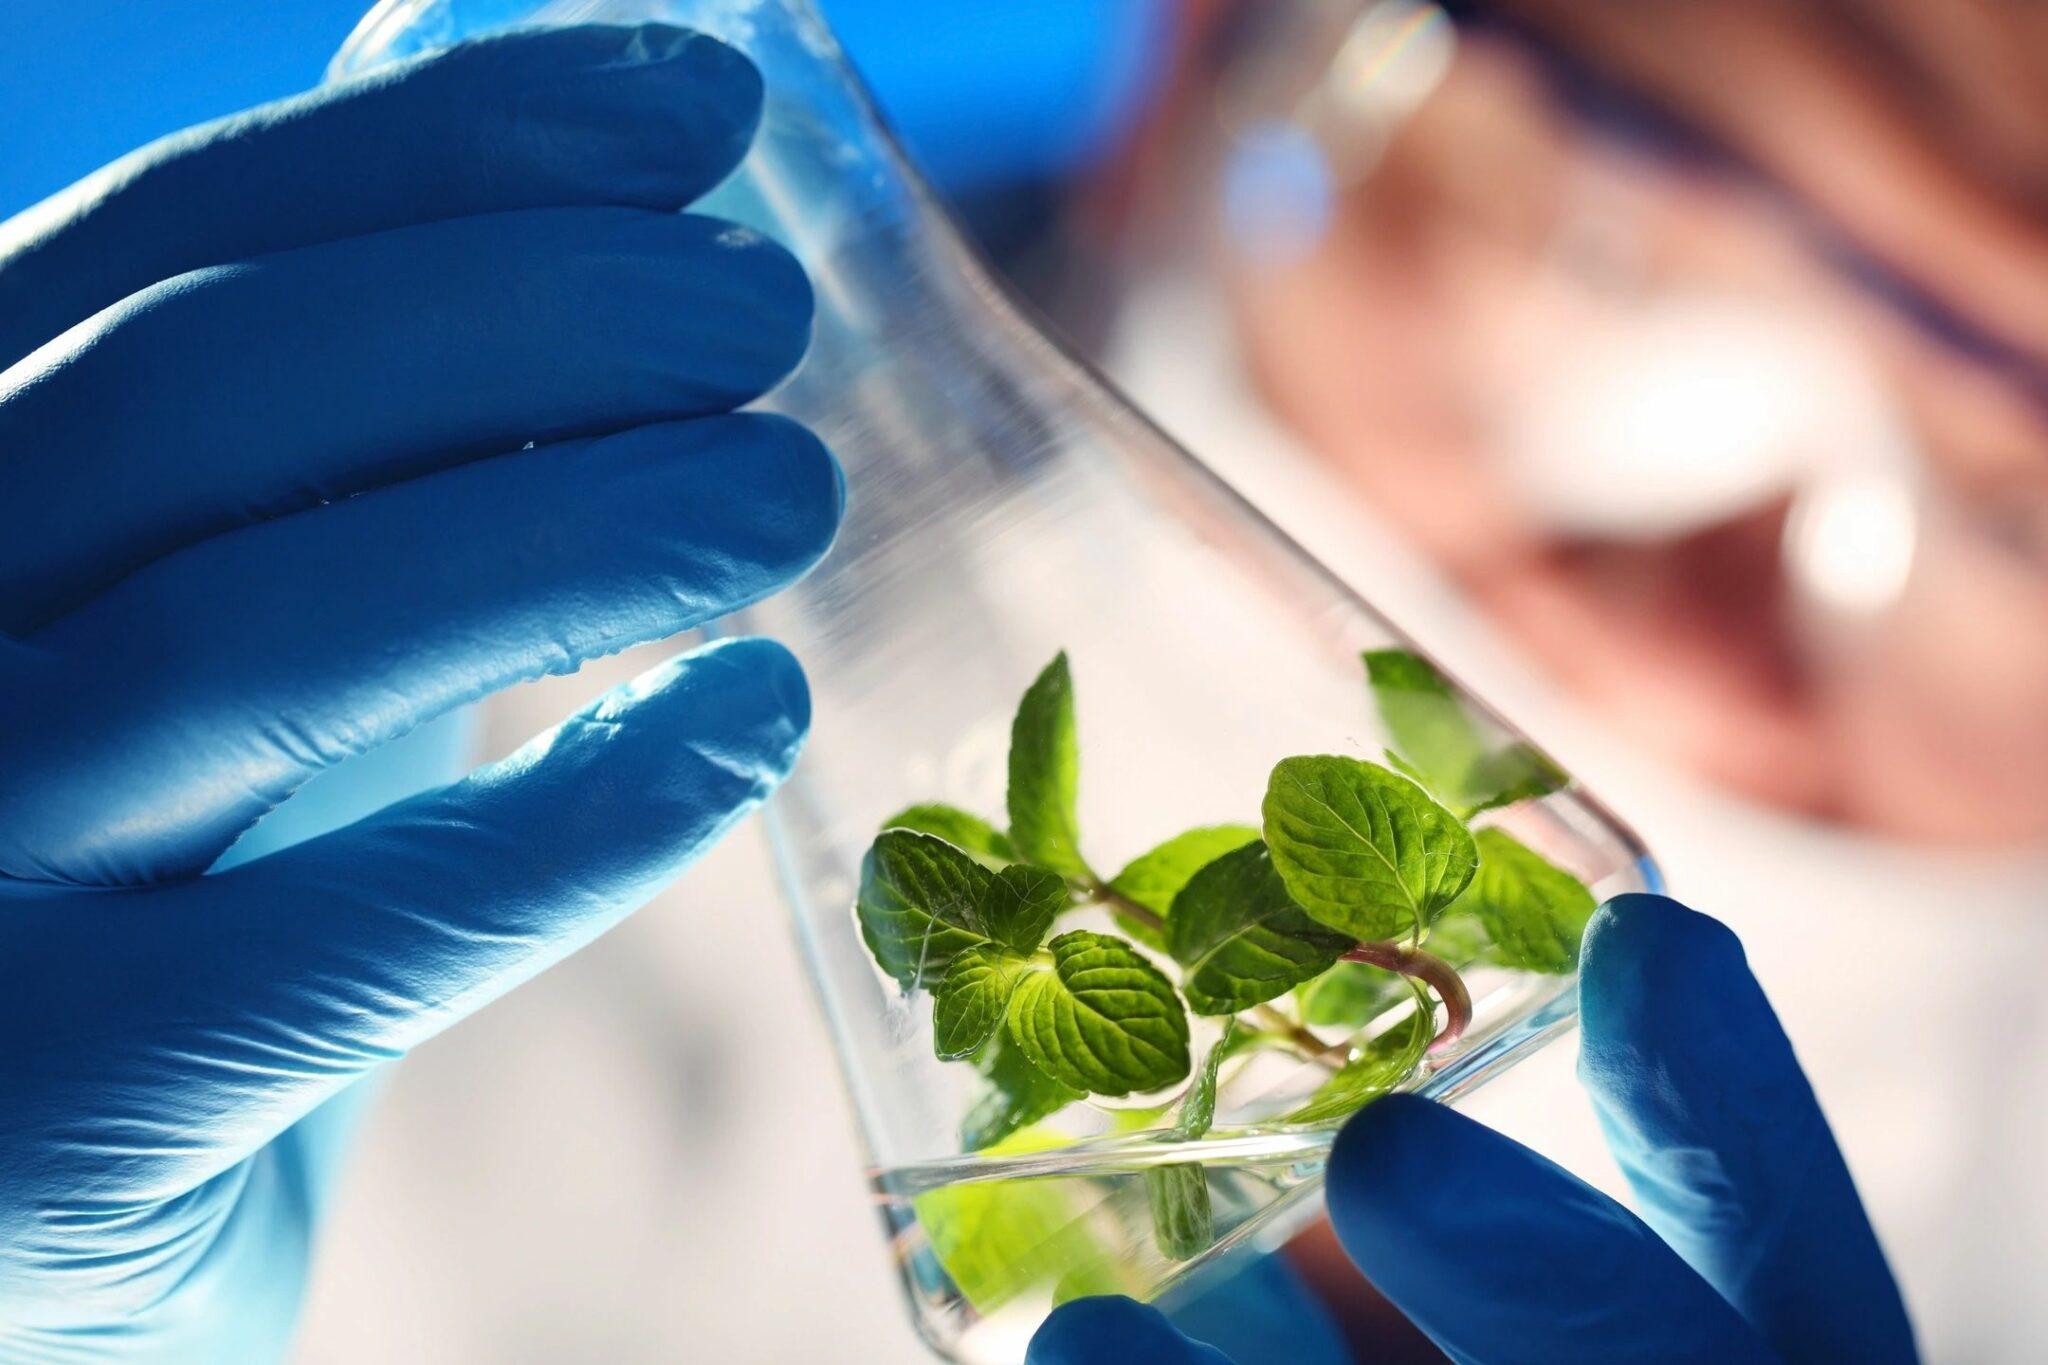 Cultivation Process Engineers - Integratedbio